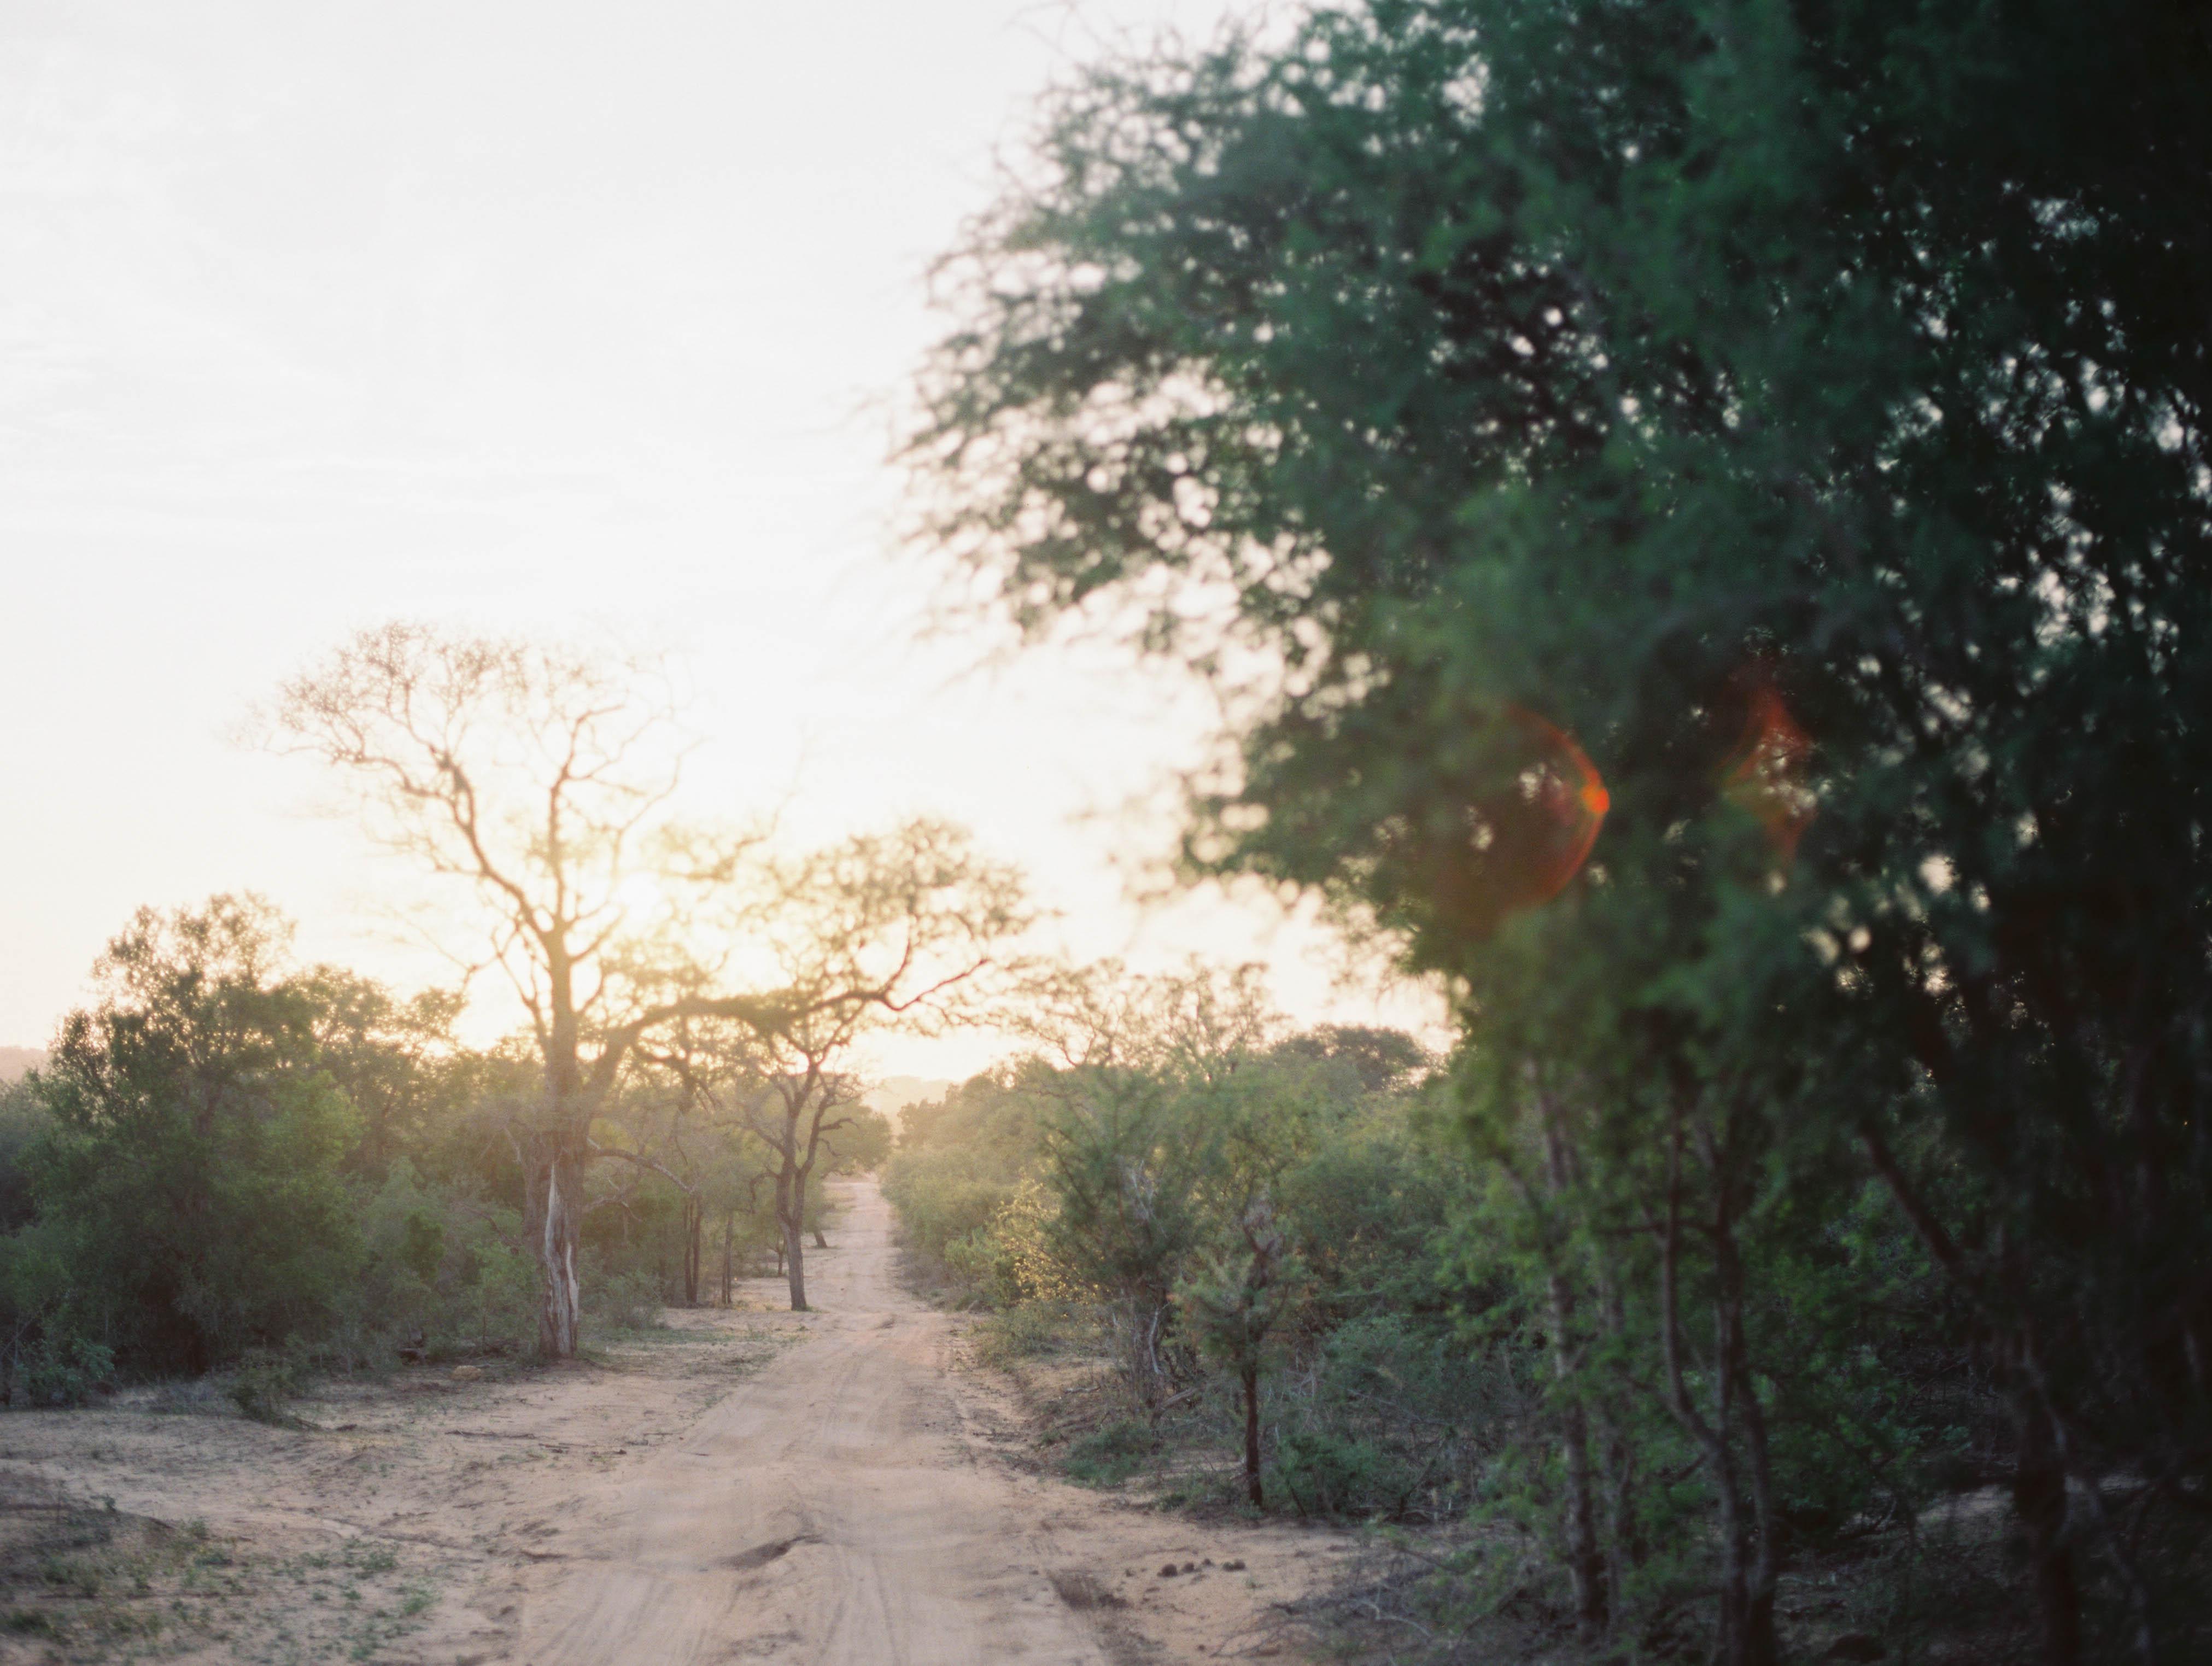 McKenna_Bleu_South_Africa_Lion_Sands_Stacy_Bauer_Photography-9-27